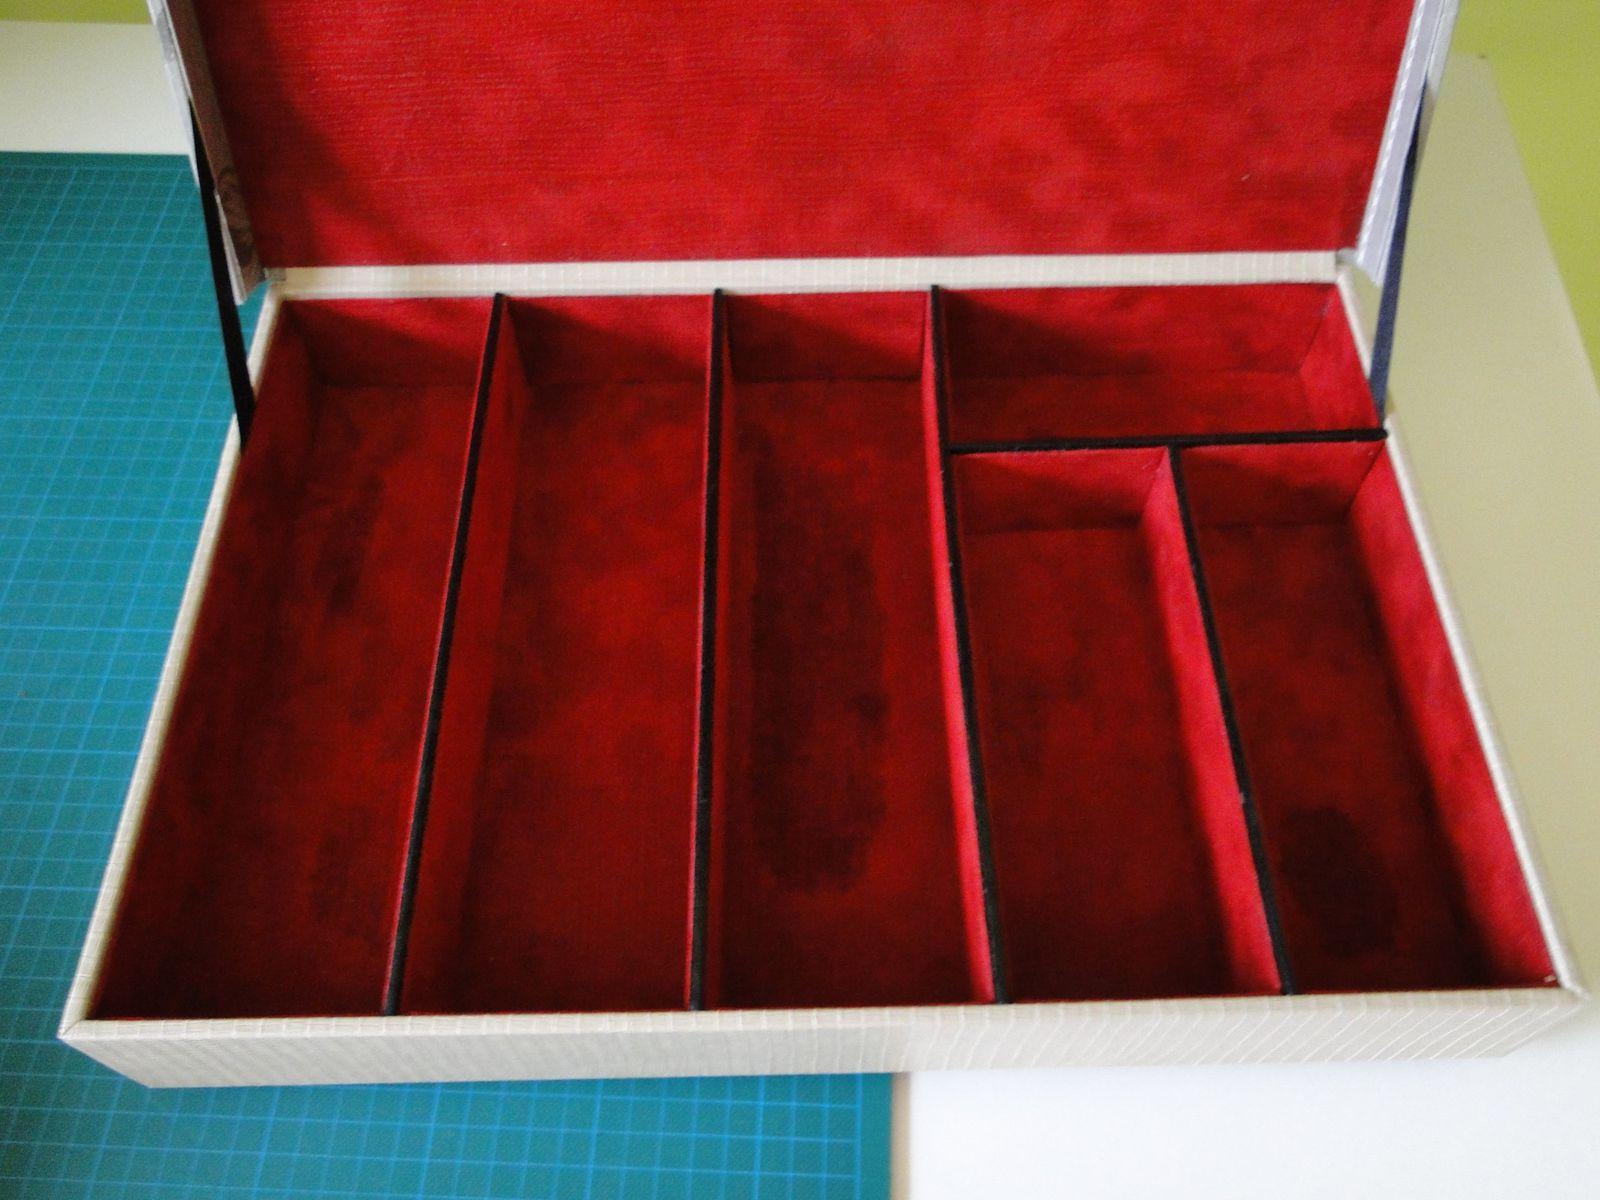 cartonnages de l 39 t le blog de catherine molinatti. Black Bedroom Furniture Sets. Home Design Ideas